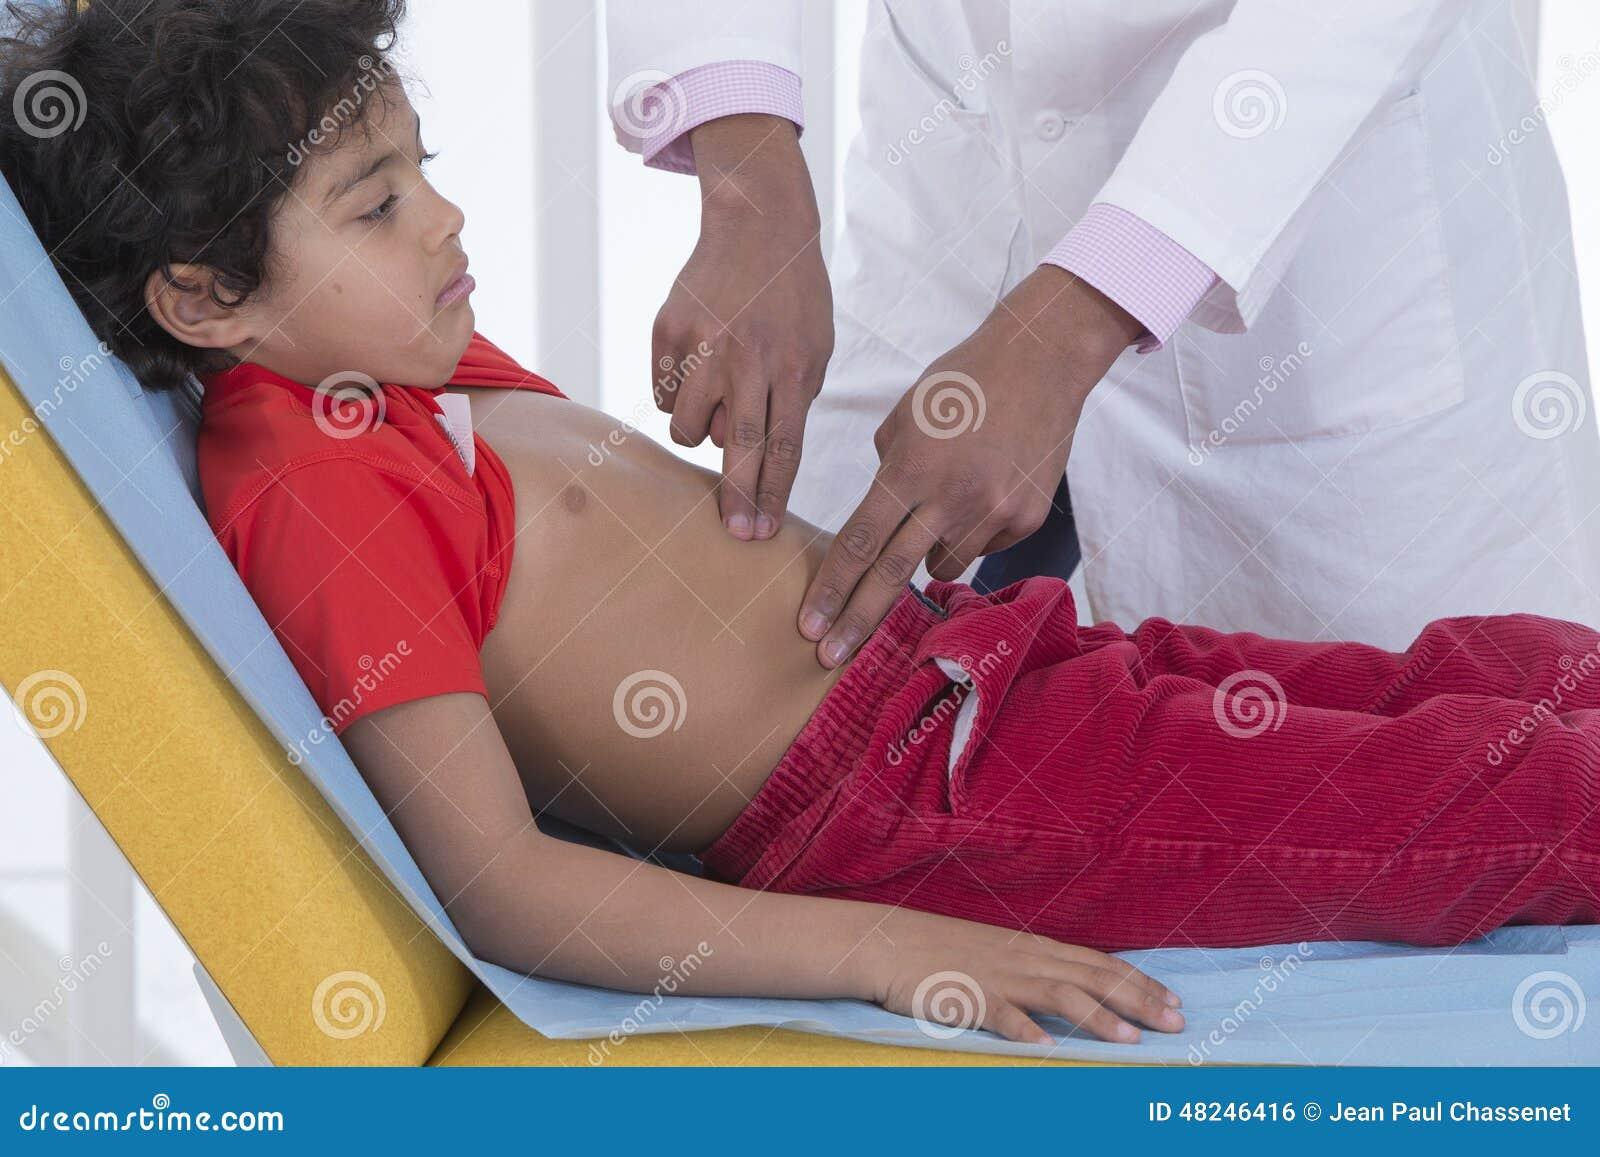 Abdominal Pain Child Stock Photo Image Of Doctor Pediatric